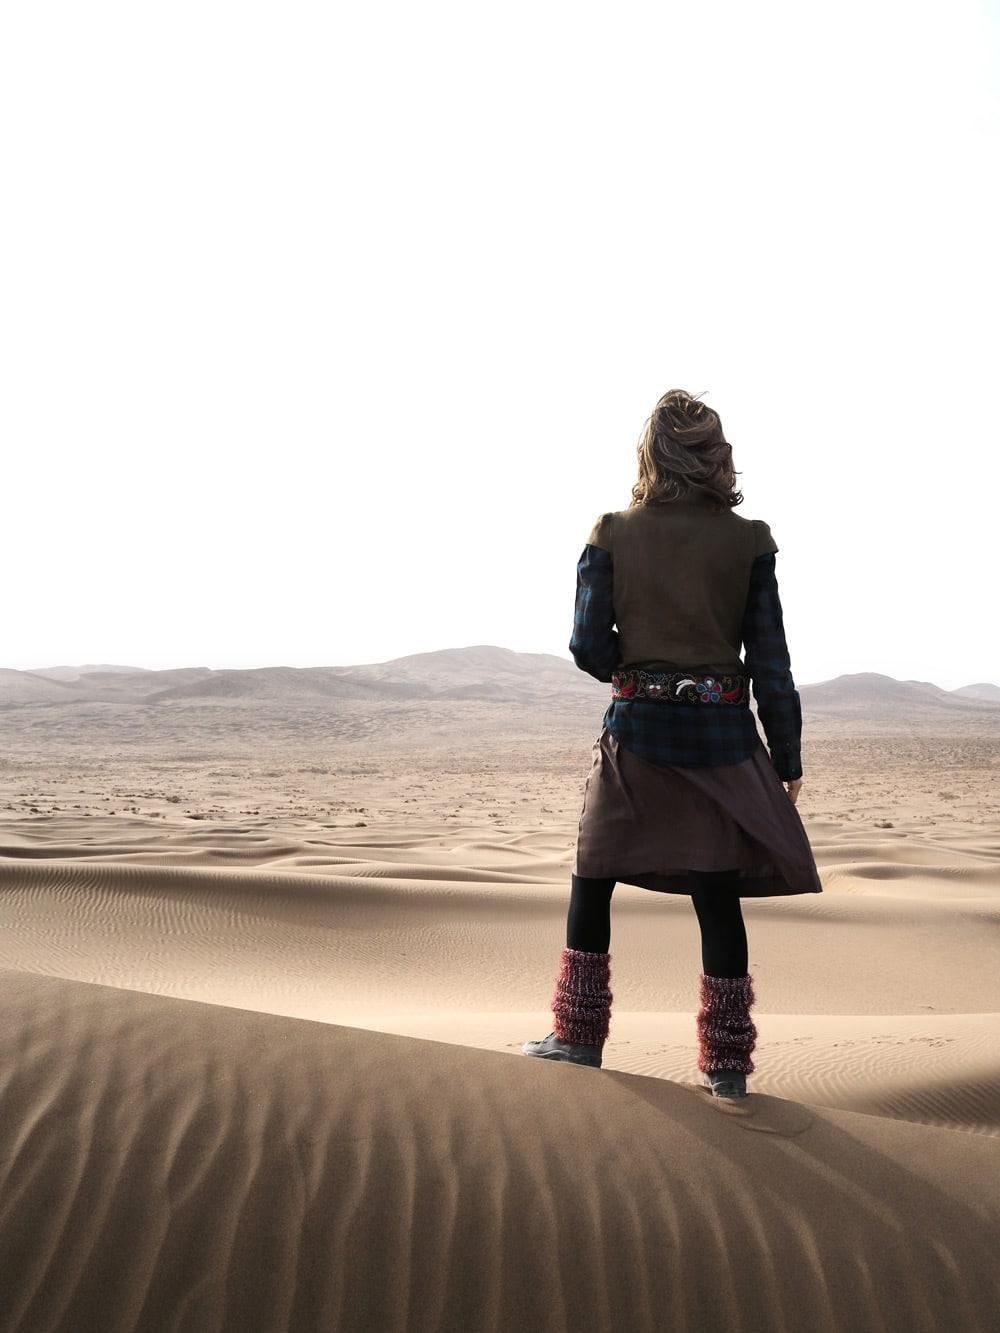 Le plus beau désert chine Badain Jaran voyage